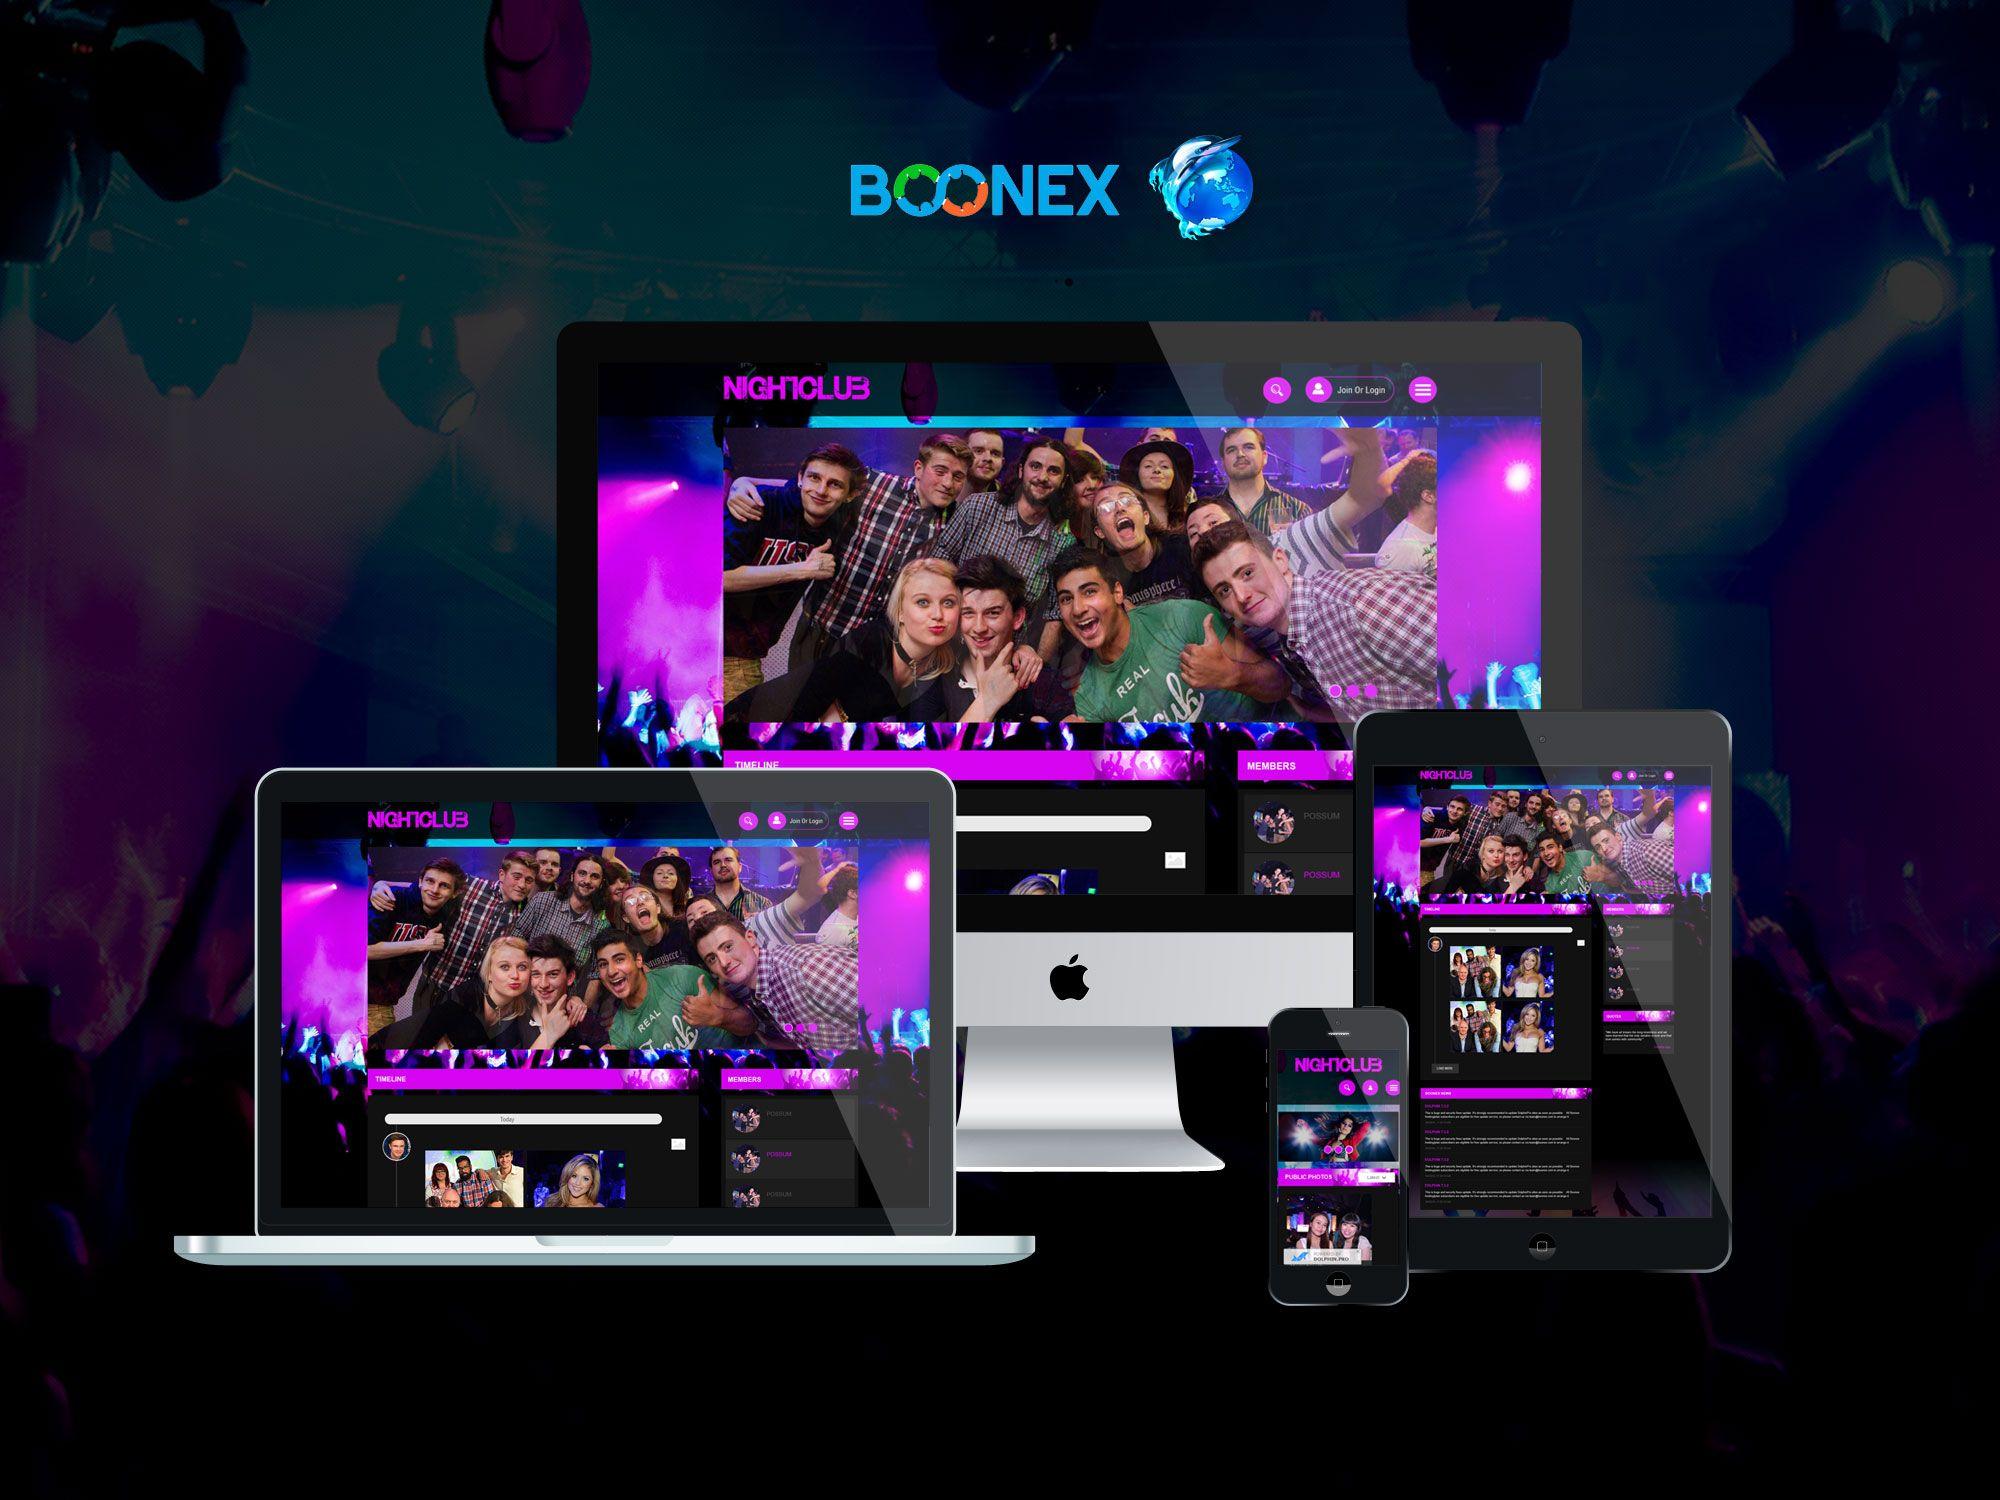 Night Club - Download Premium boonex dolphin template, Download ...